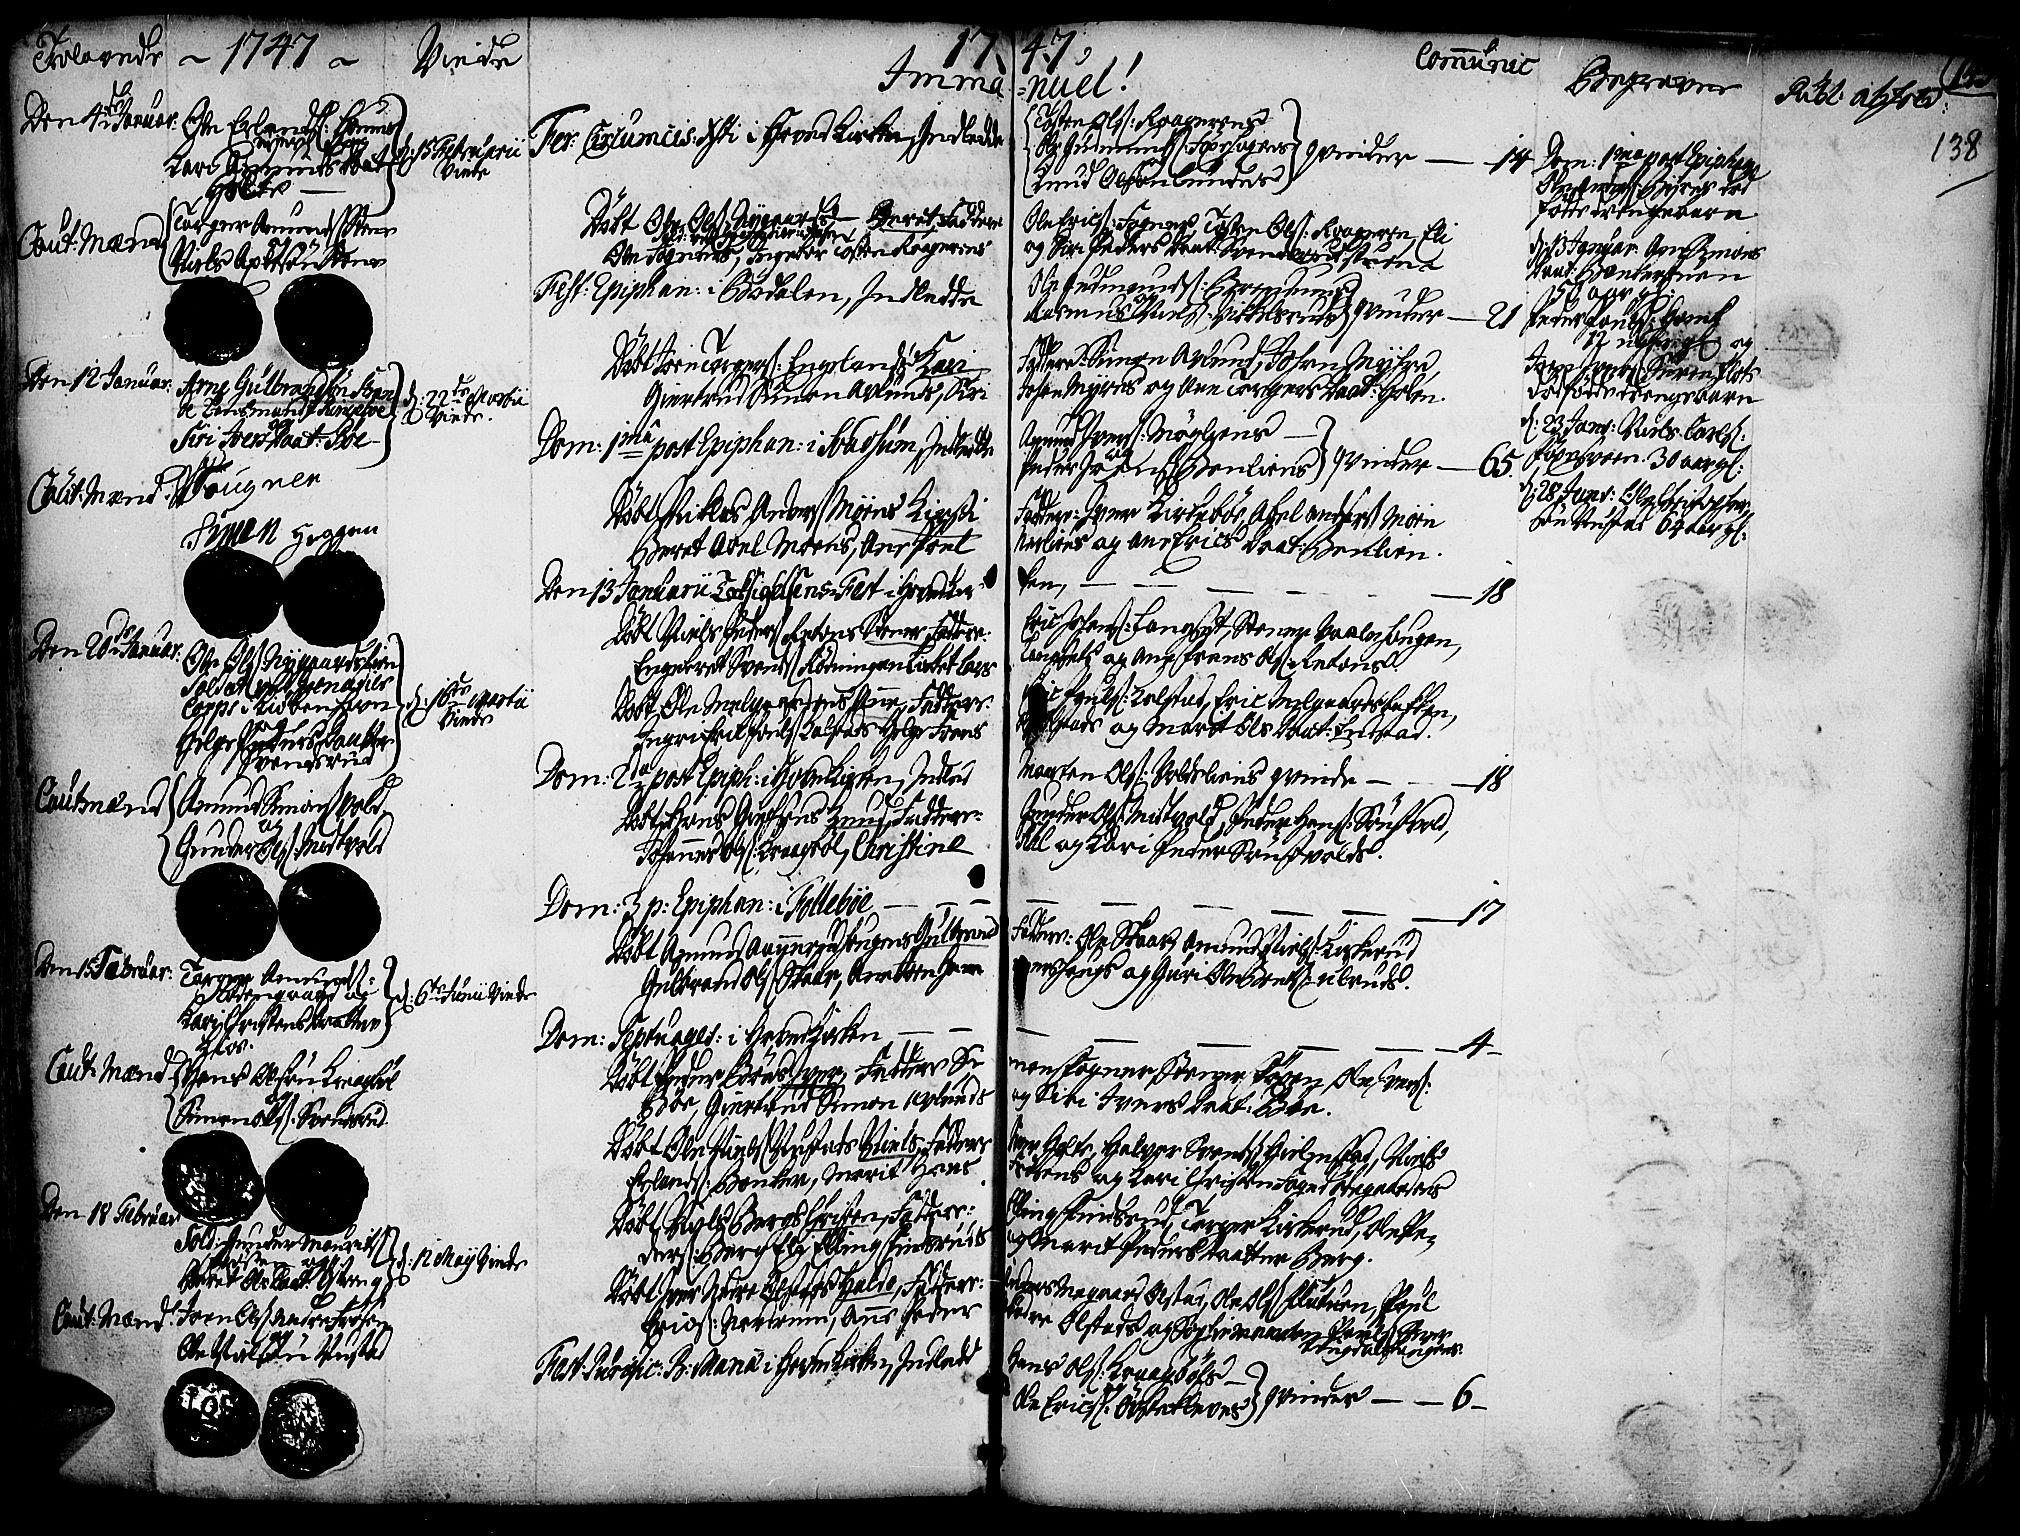 SAH, Gausdal prestekontor, Ministerialbok nr. 2, 1729-1757, s. 138